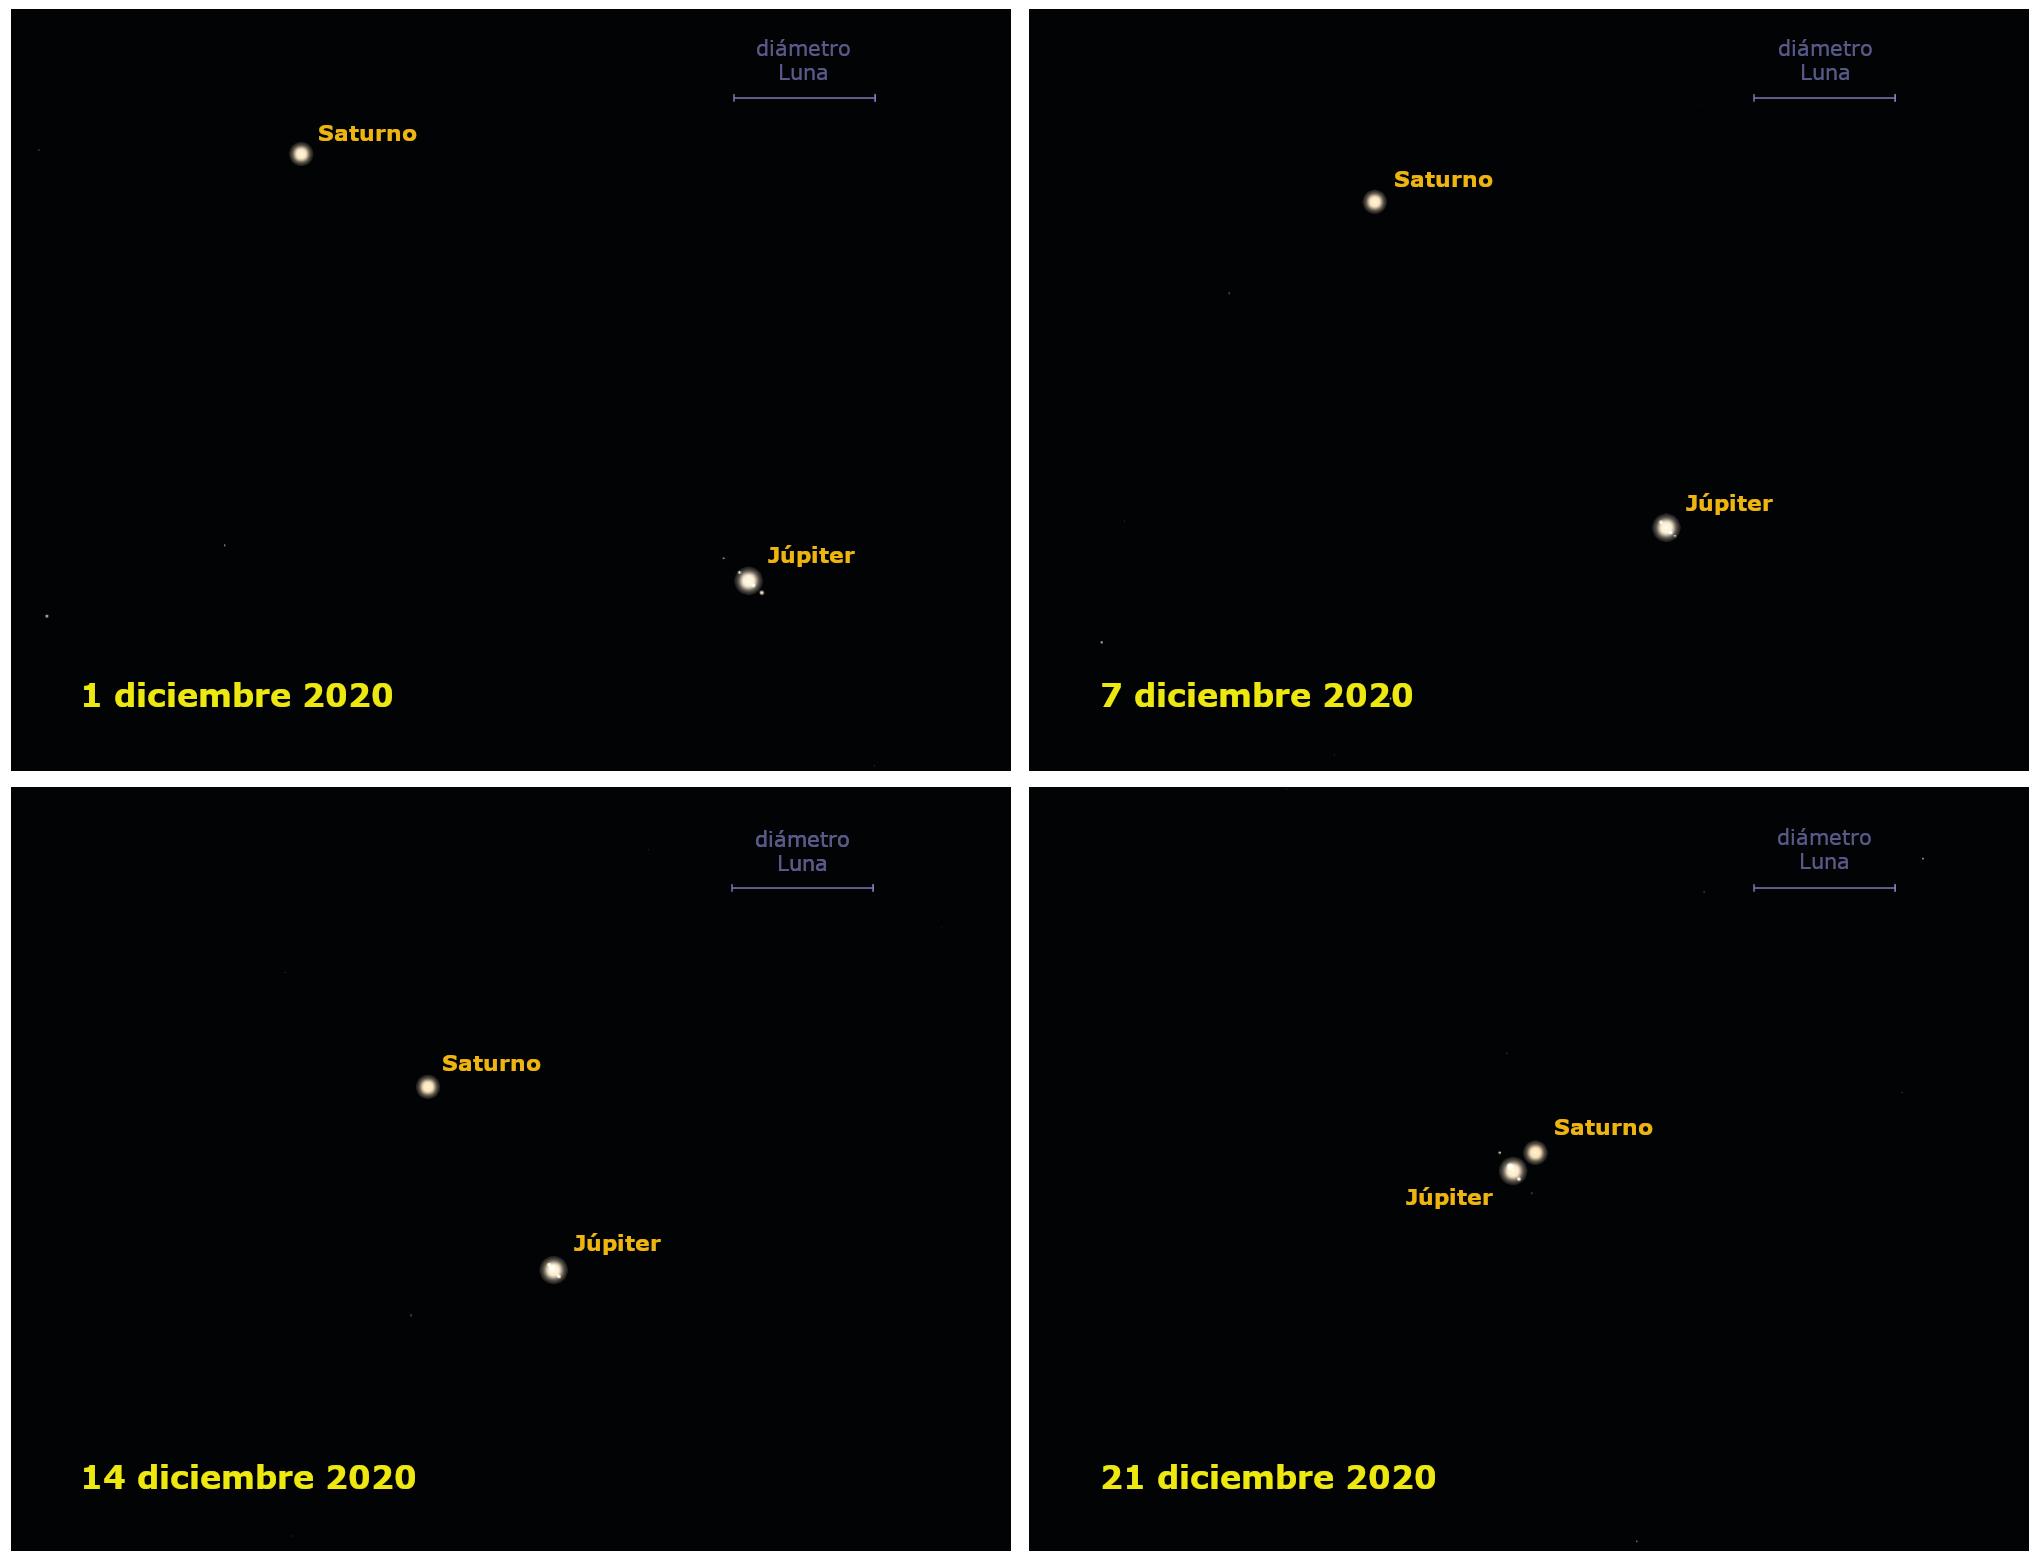 Conjuncion Jupiter Saturno. Real Observatorio